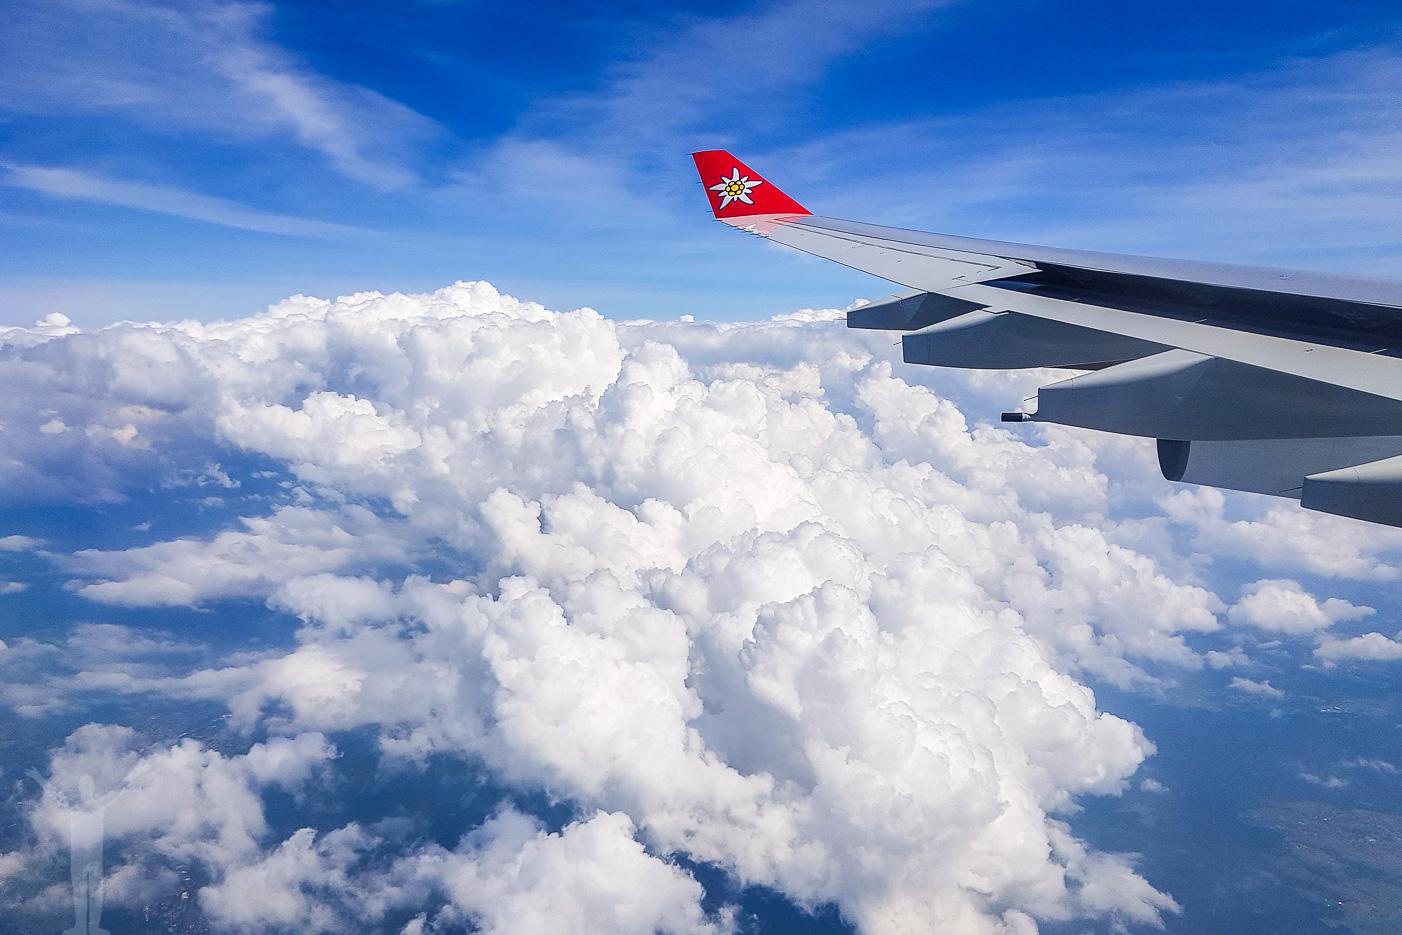 Uppe bland molnen innan landning i Zürich